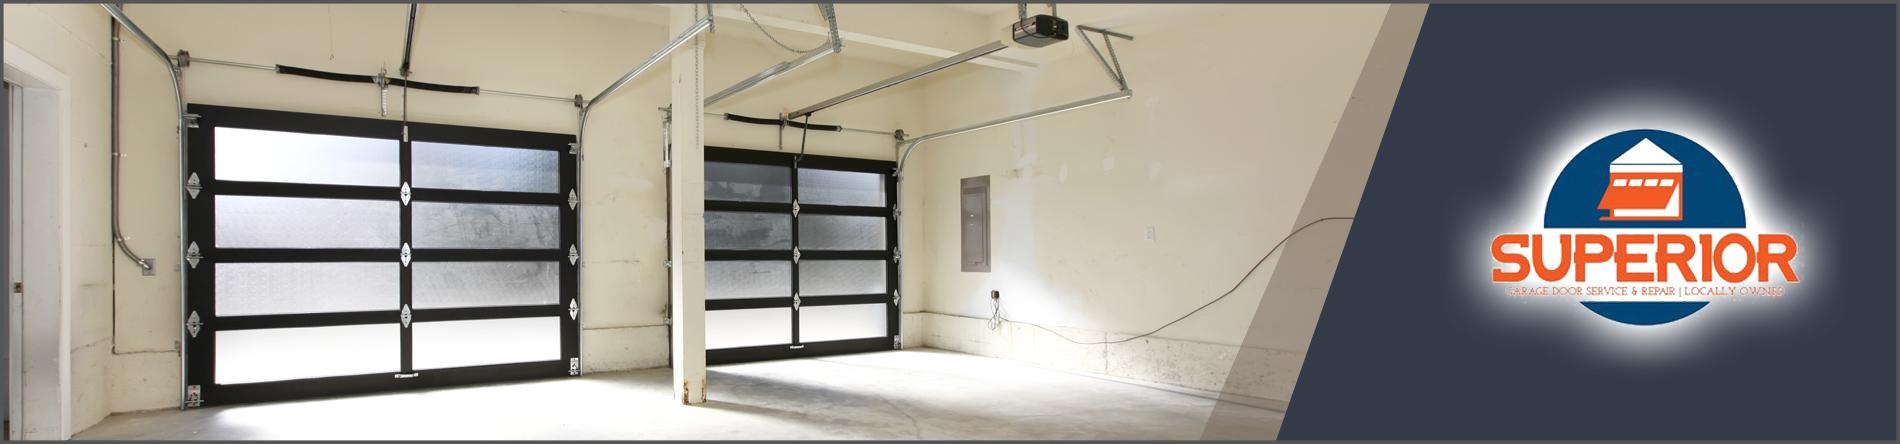 Superior Garage Door Service And Repair Is A Garage ...